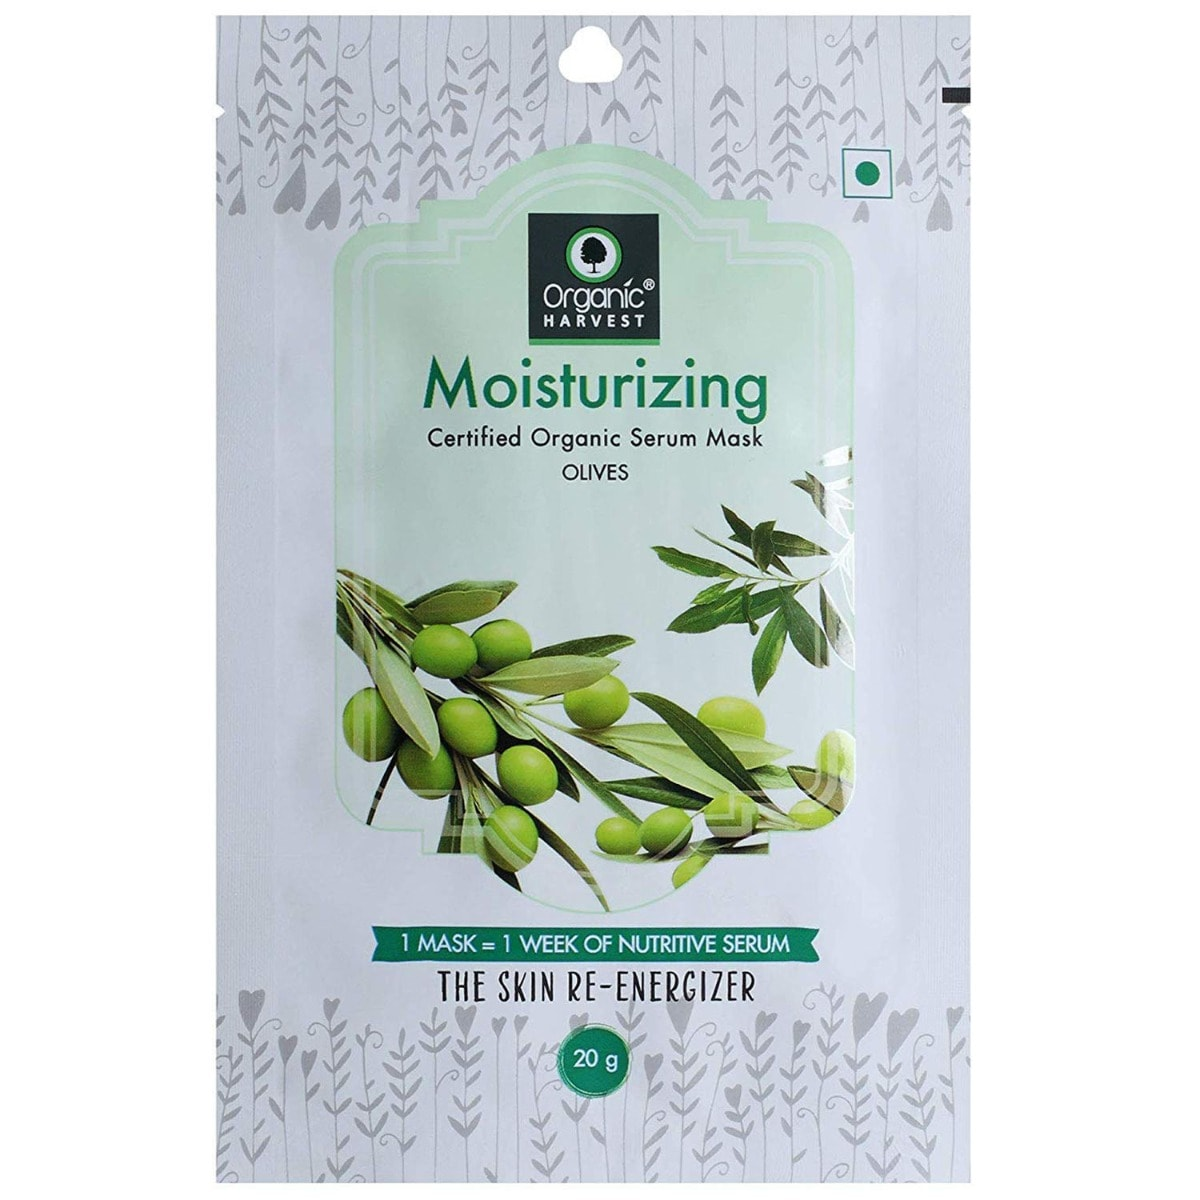 Organic Harvest Moisturizing Serum Mask, 20 gm